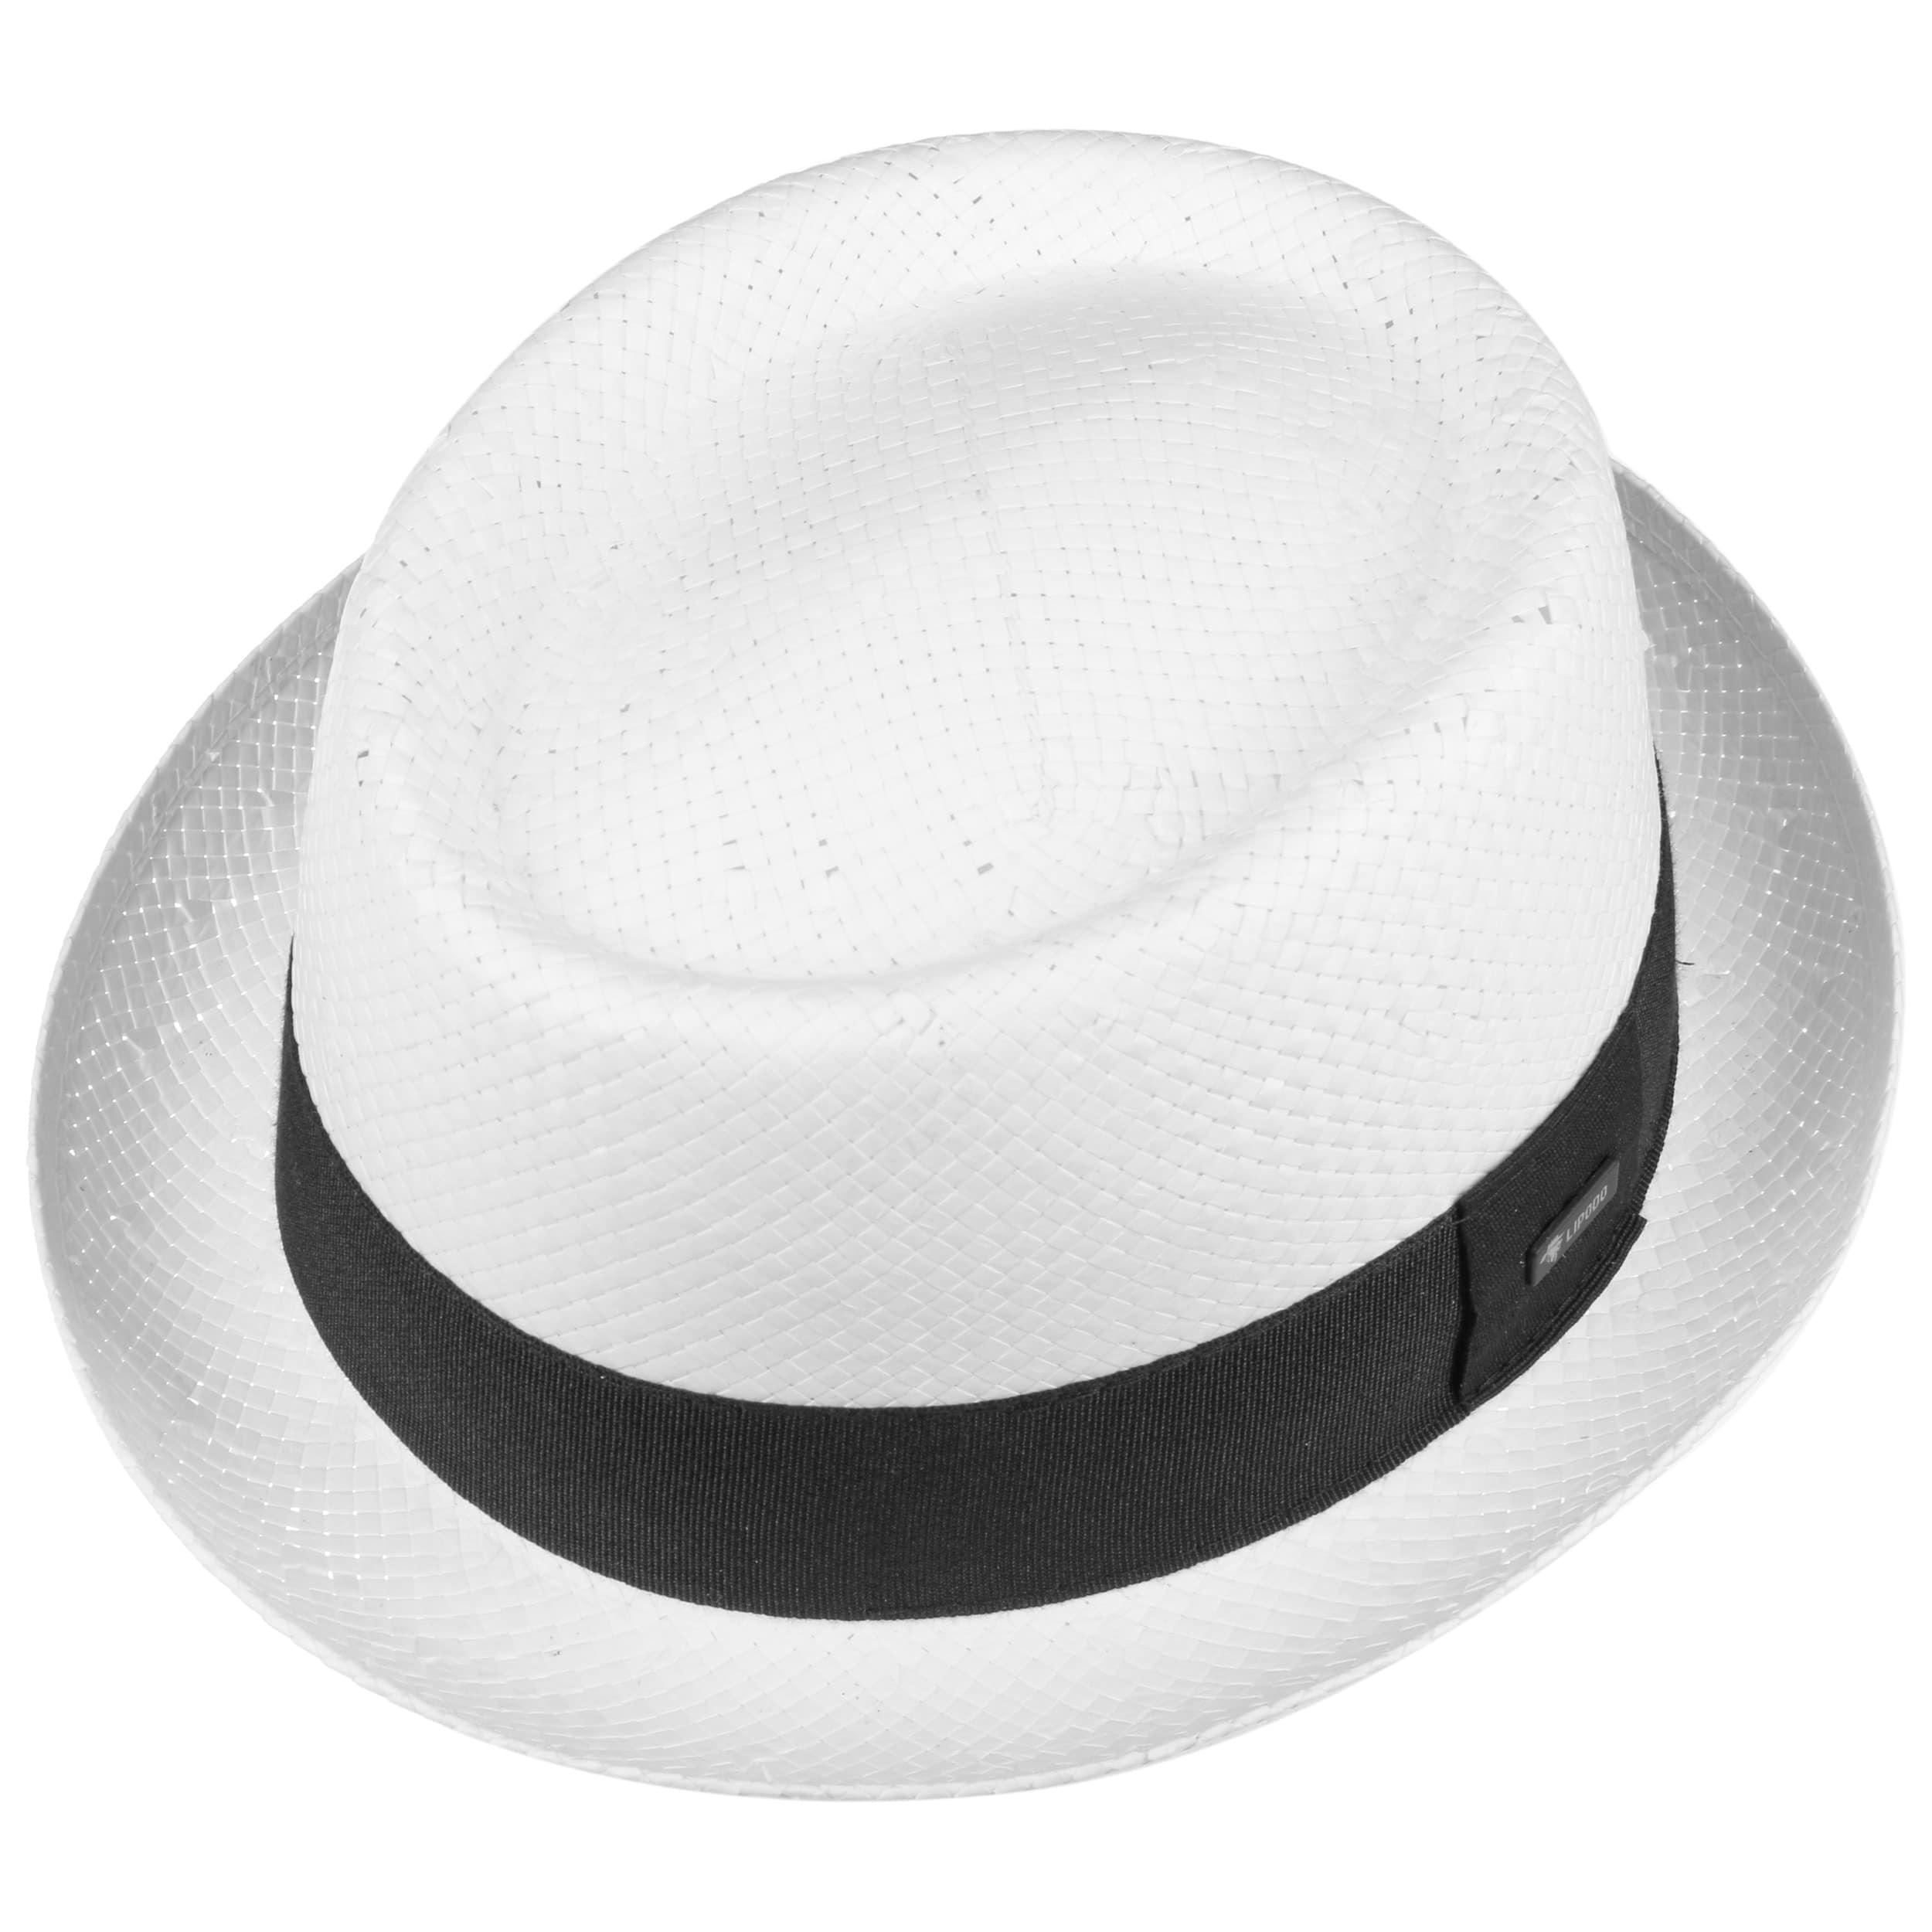 946b375c1fe Acapulco White Pork Pie Hat by Lipodo - white 1 ...